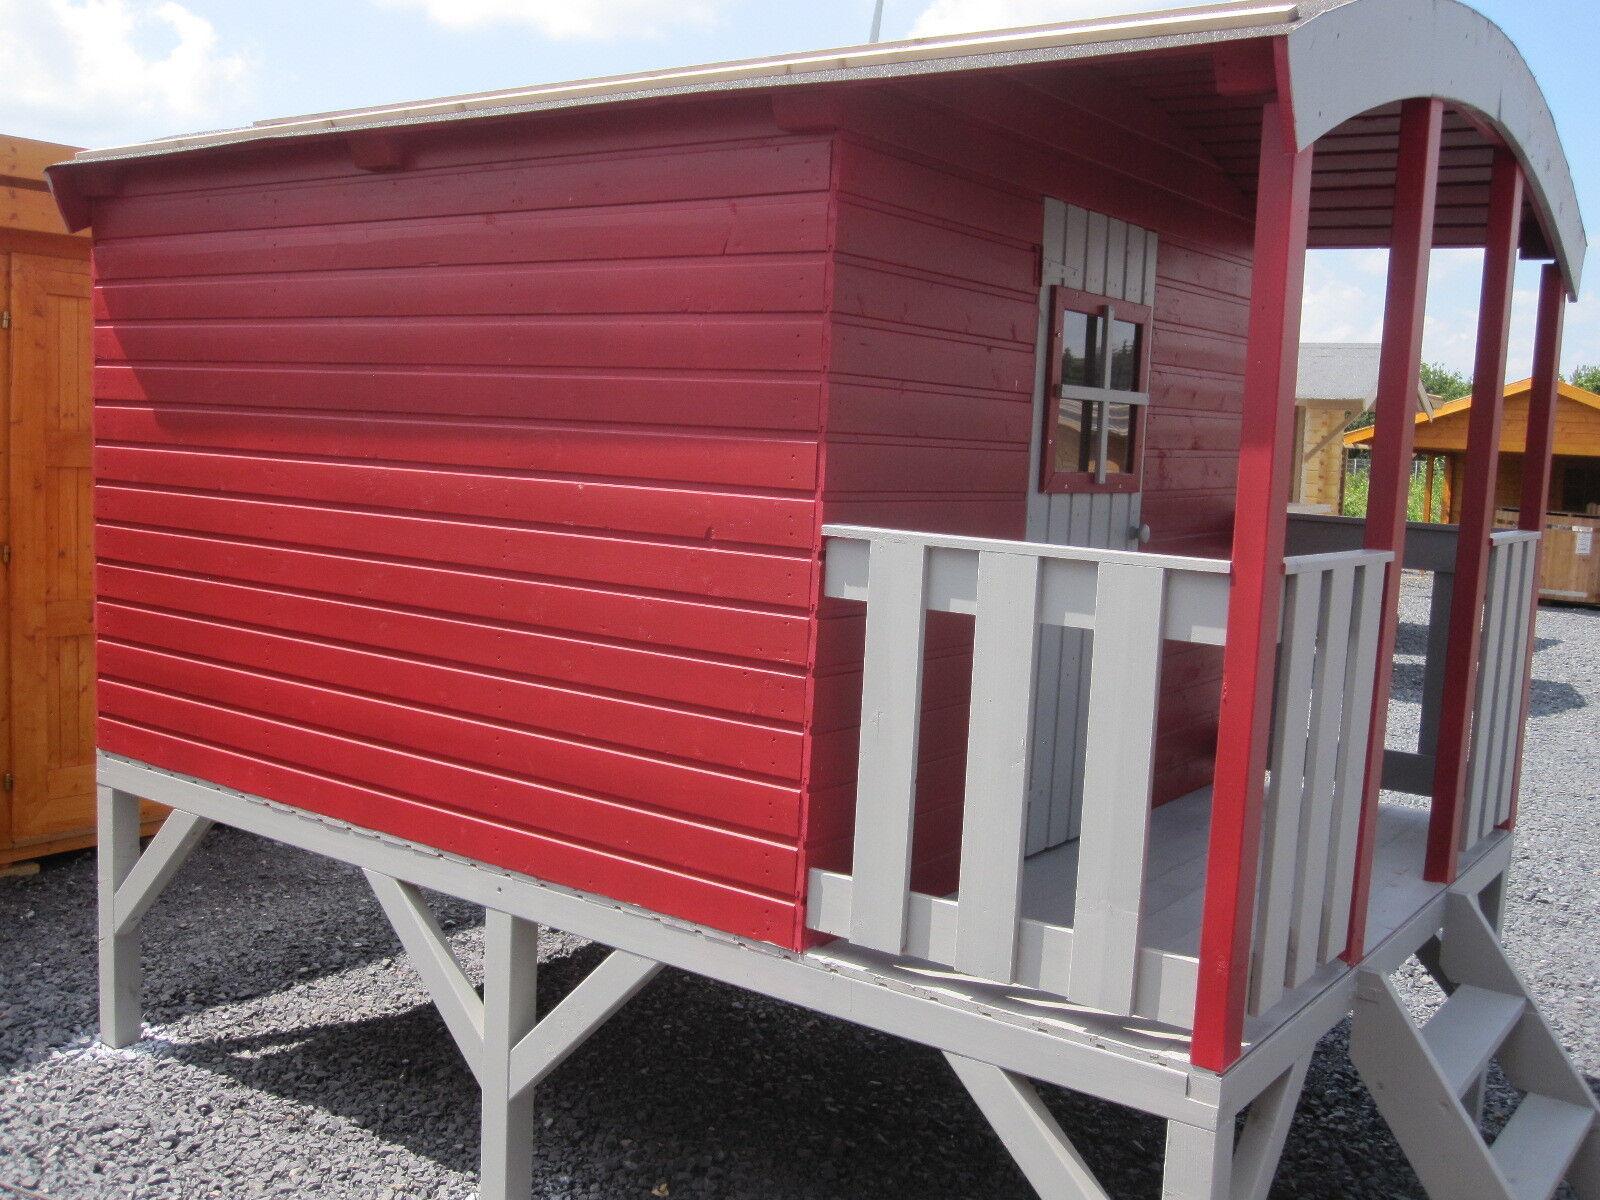 kinderhaus bauwagen zirkuswagen kinderspielhaus gartenhaus stelzenhaus holz haus ebay. Black Bedroom Furniture Sets. Home Design Ideas